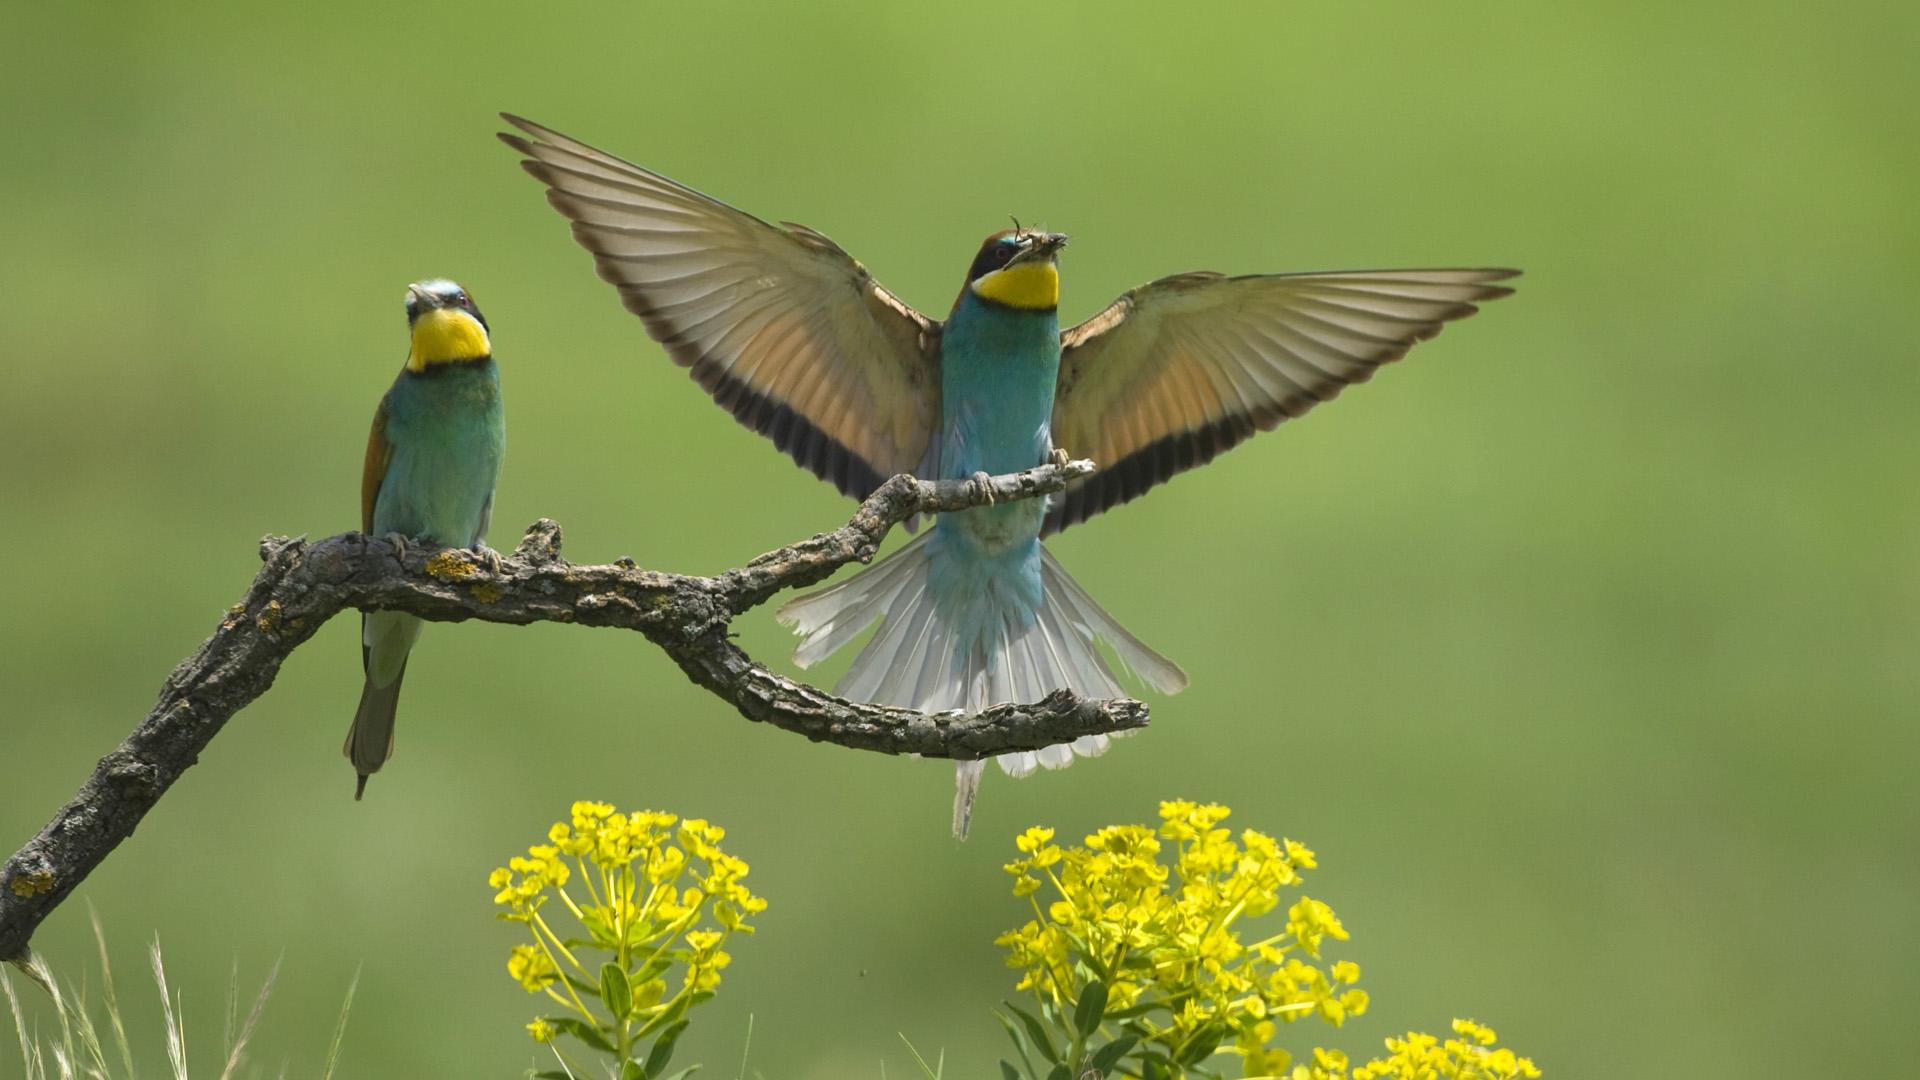 Perruche Ondulee Photo Oiseau Fond Ecran Hd